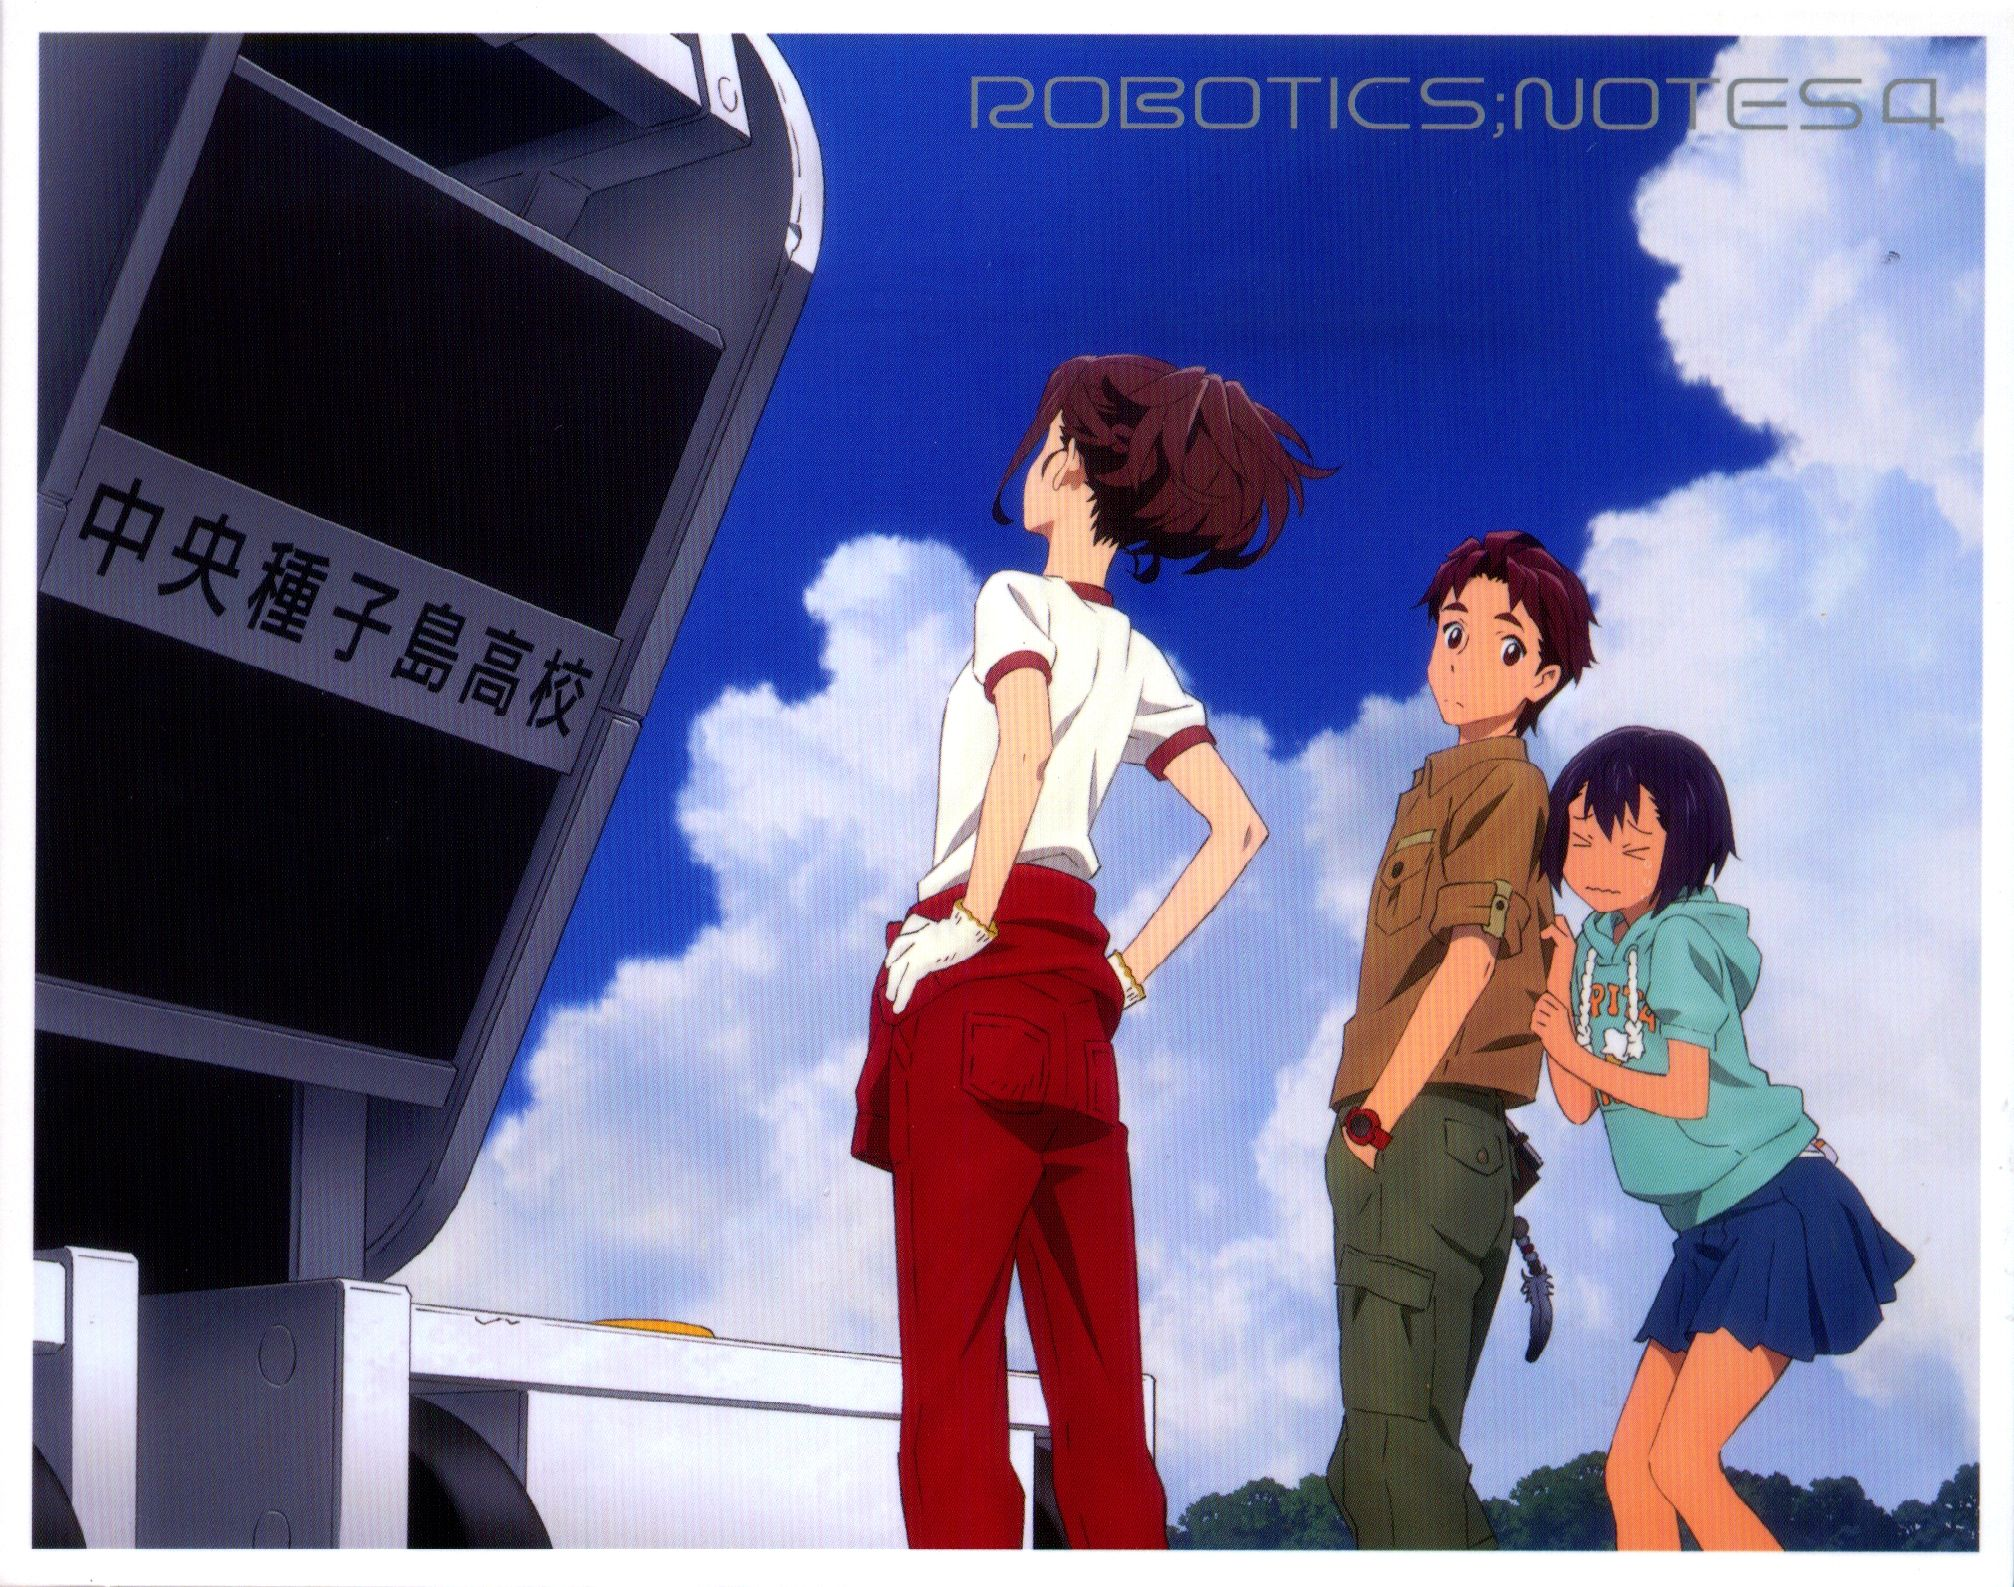 Robotics;Notes, Junna, Akiho, Kaito Sci fi anime, Anime